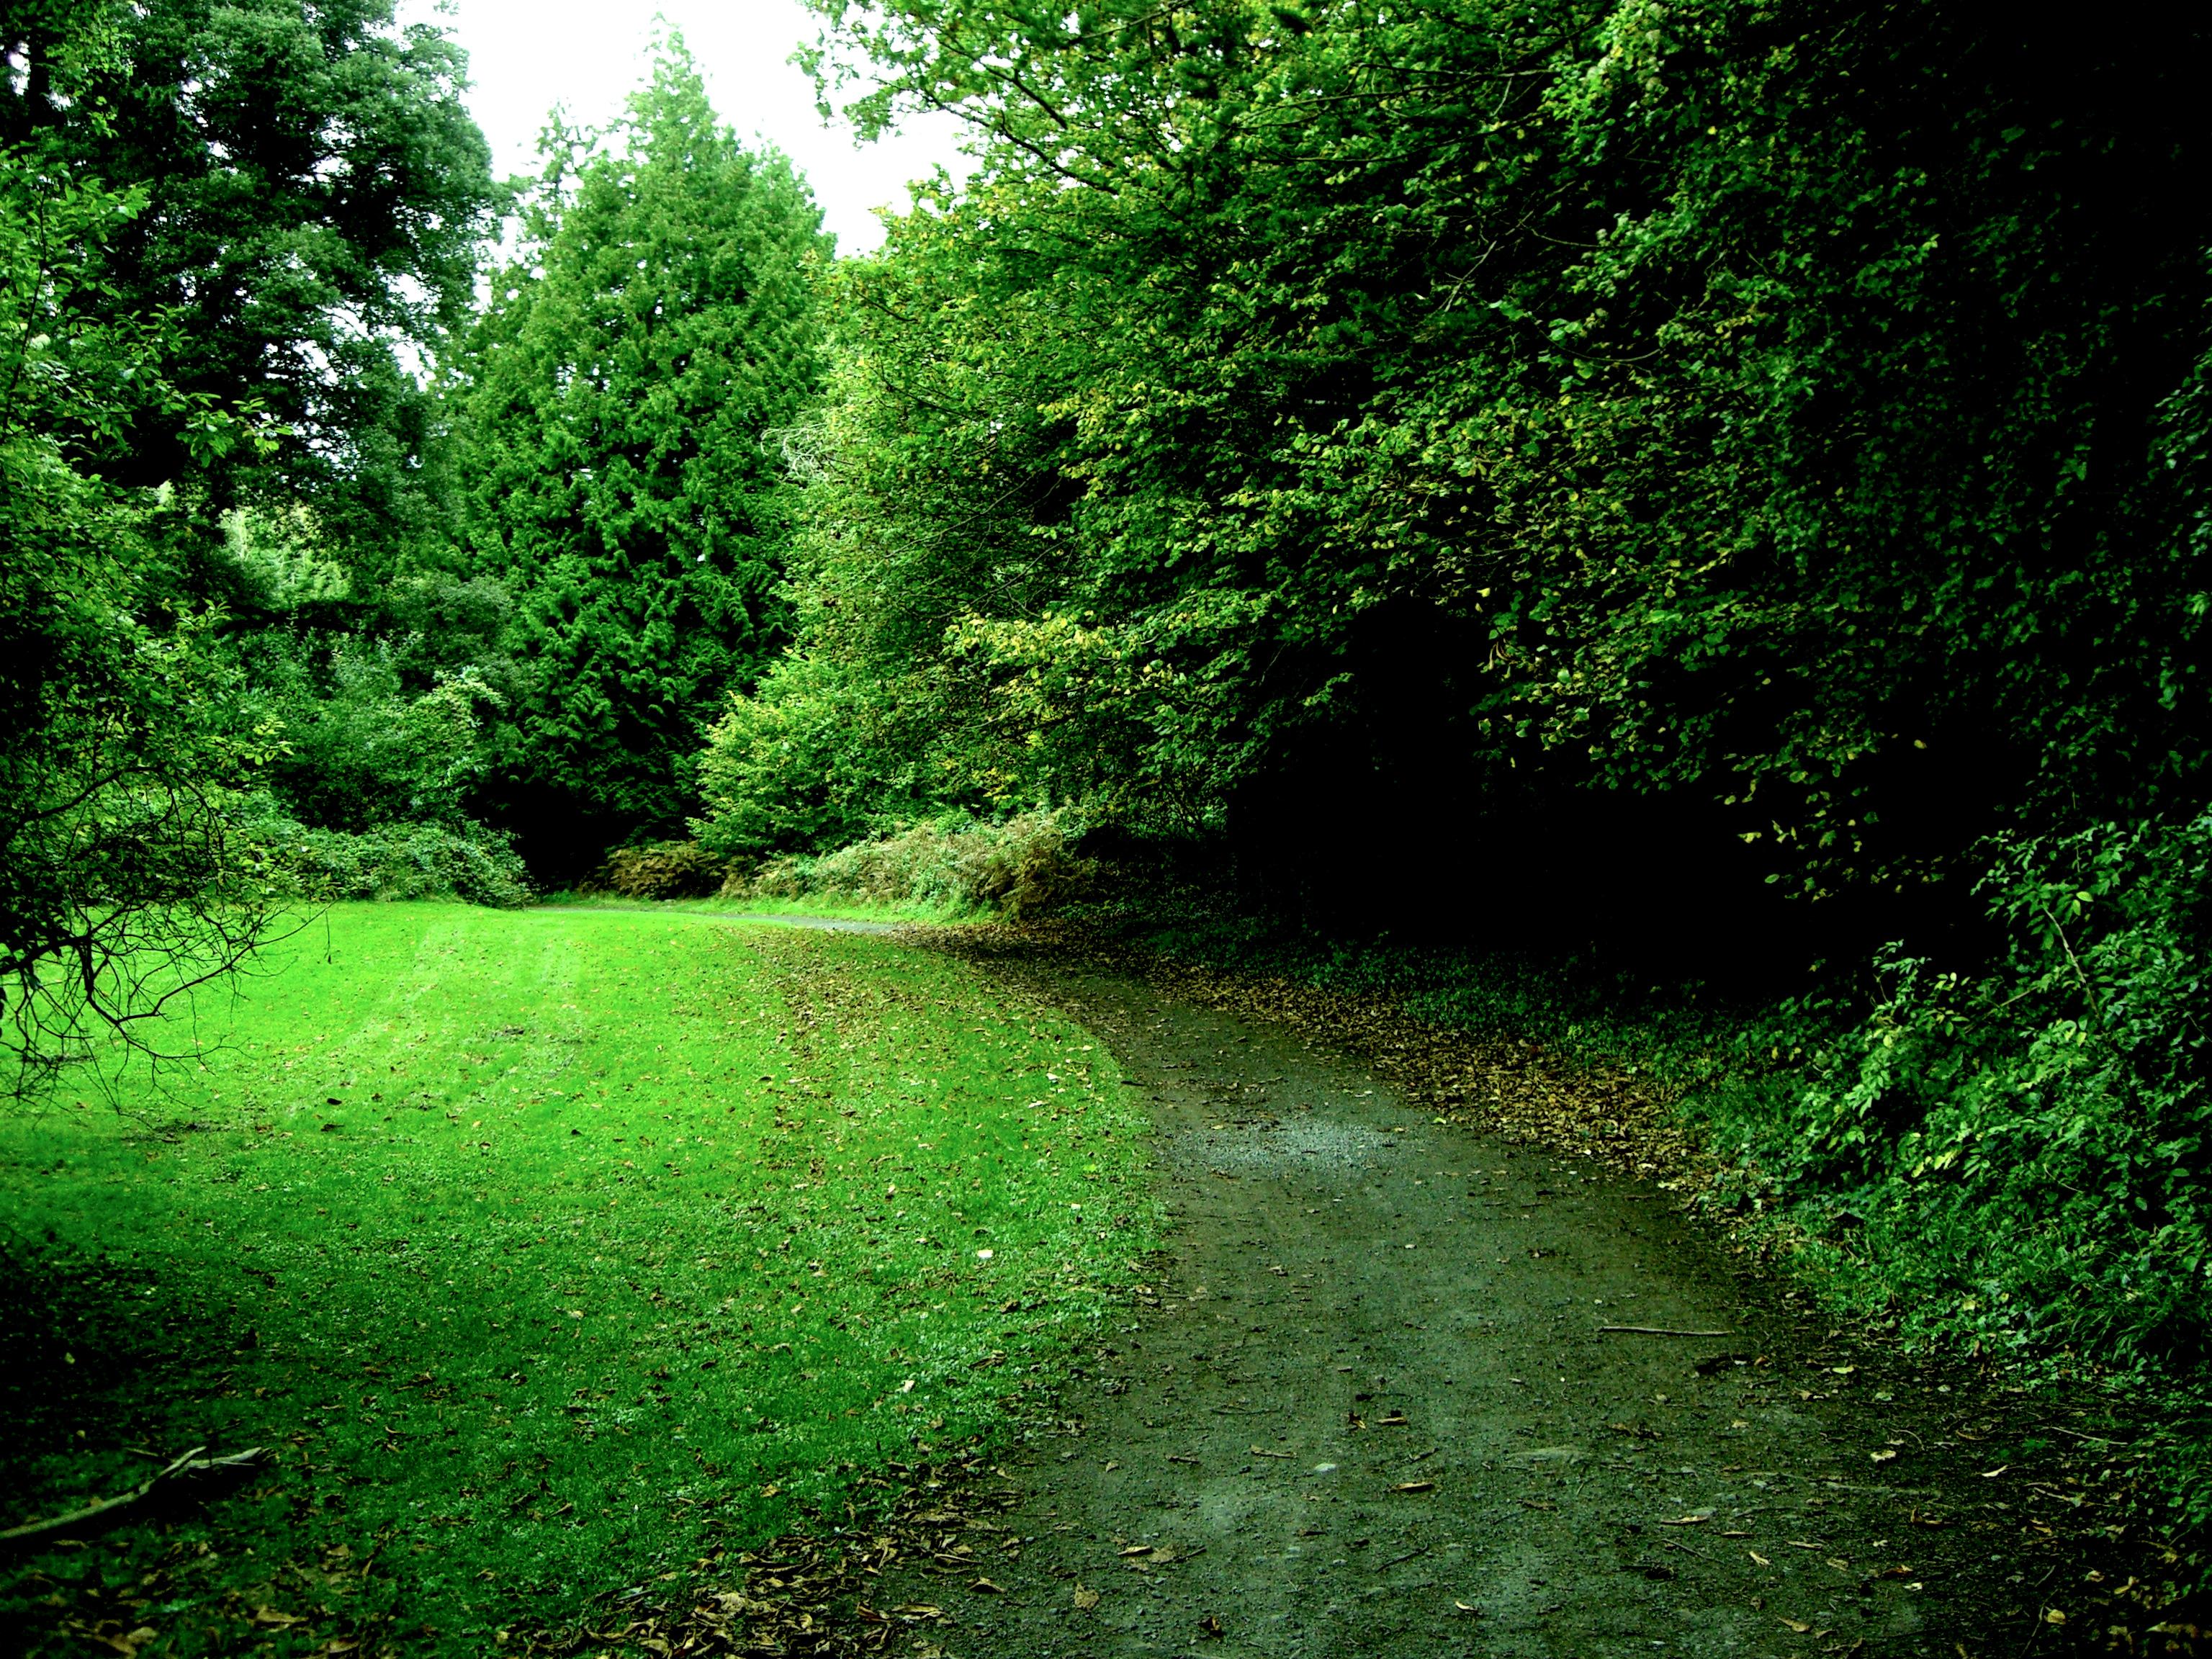 Ireland, Alone, Empty, European, Green, HQ Photo